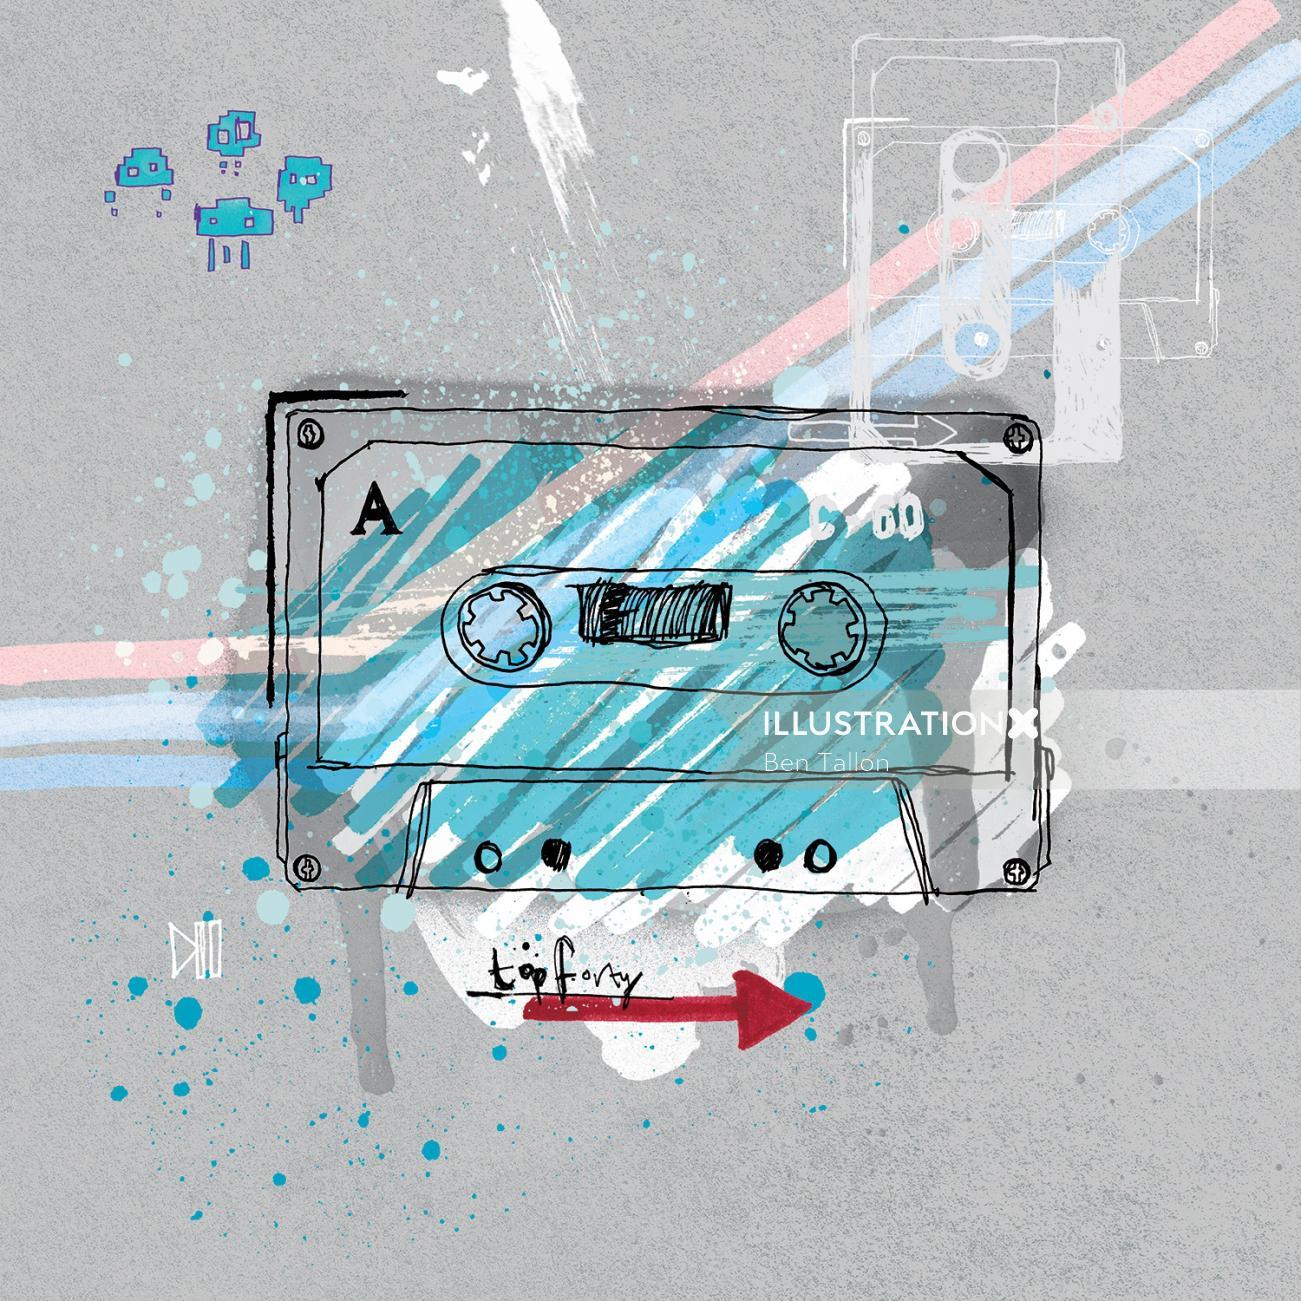 Water color design of Cassette